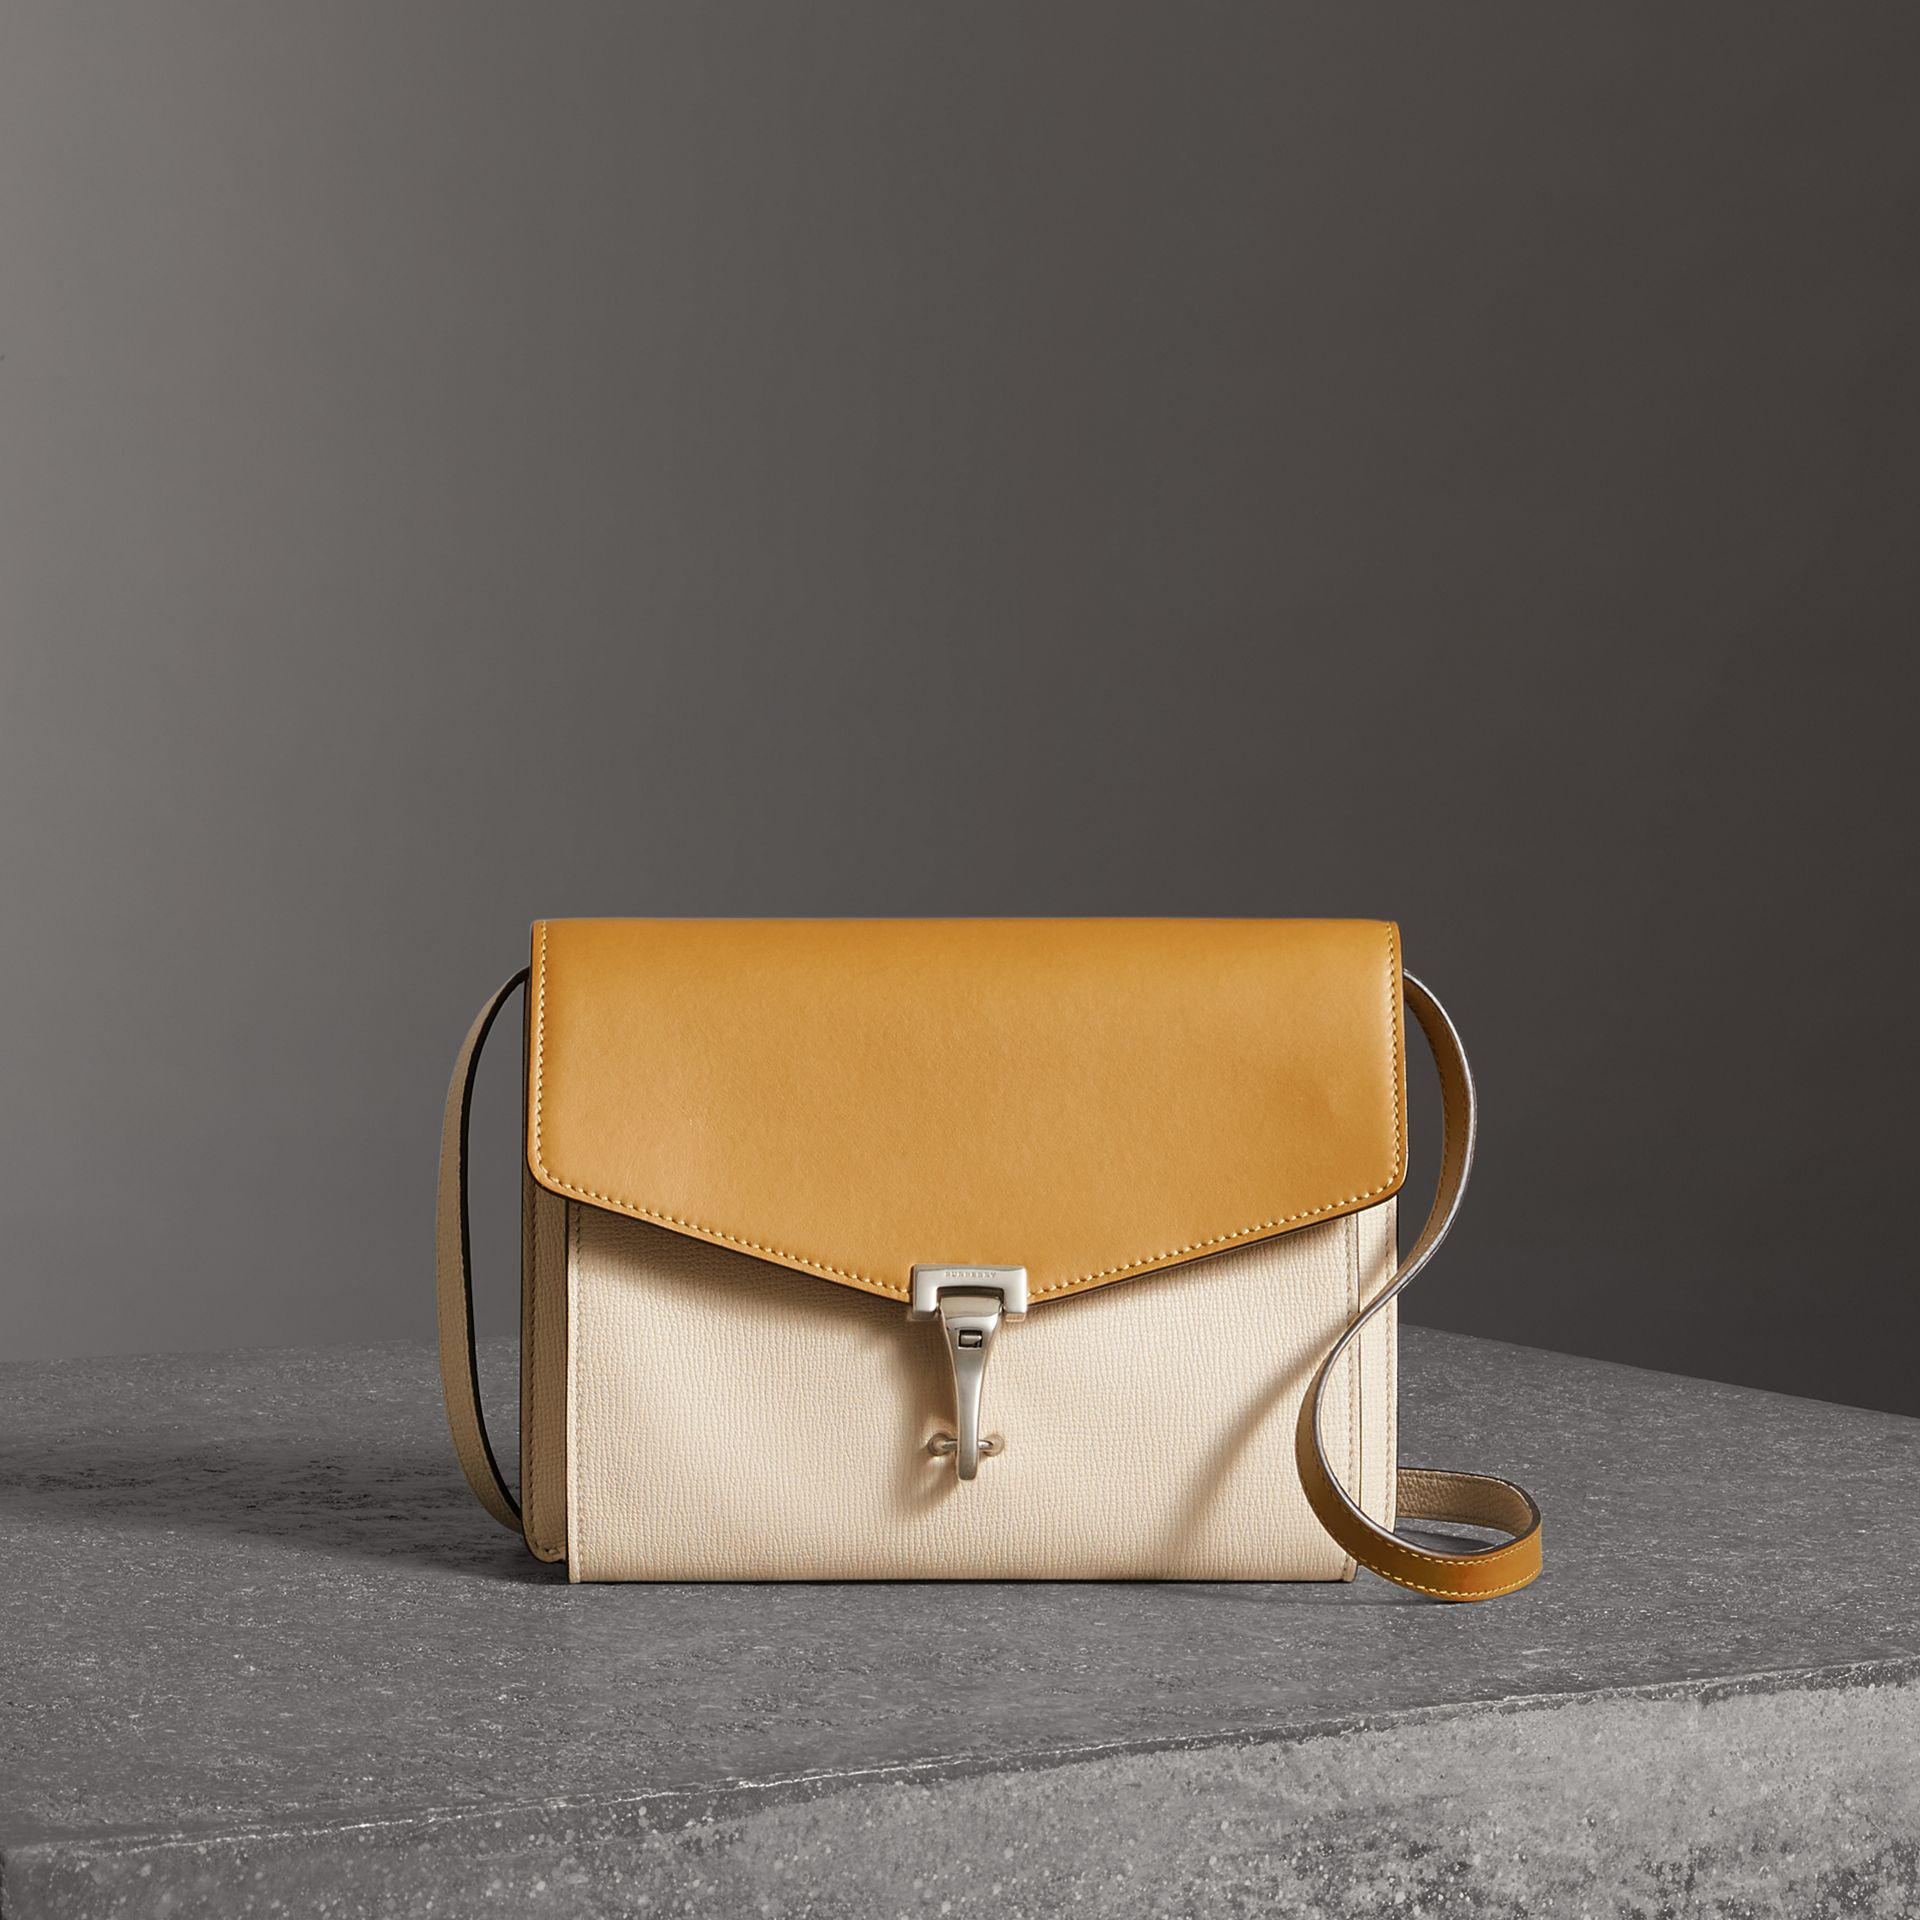 Sale 2018 Sale Huge Surprise Burberry Twotone Leather Crossbody Bag ... ec6b5c8b4e